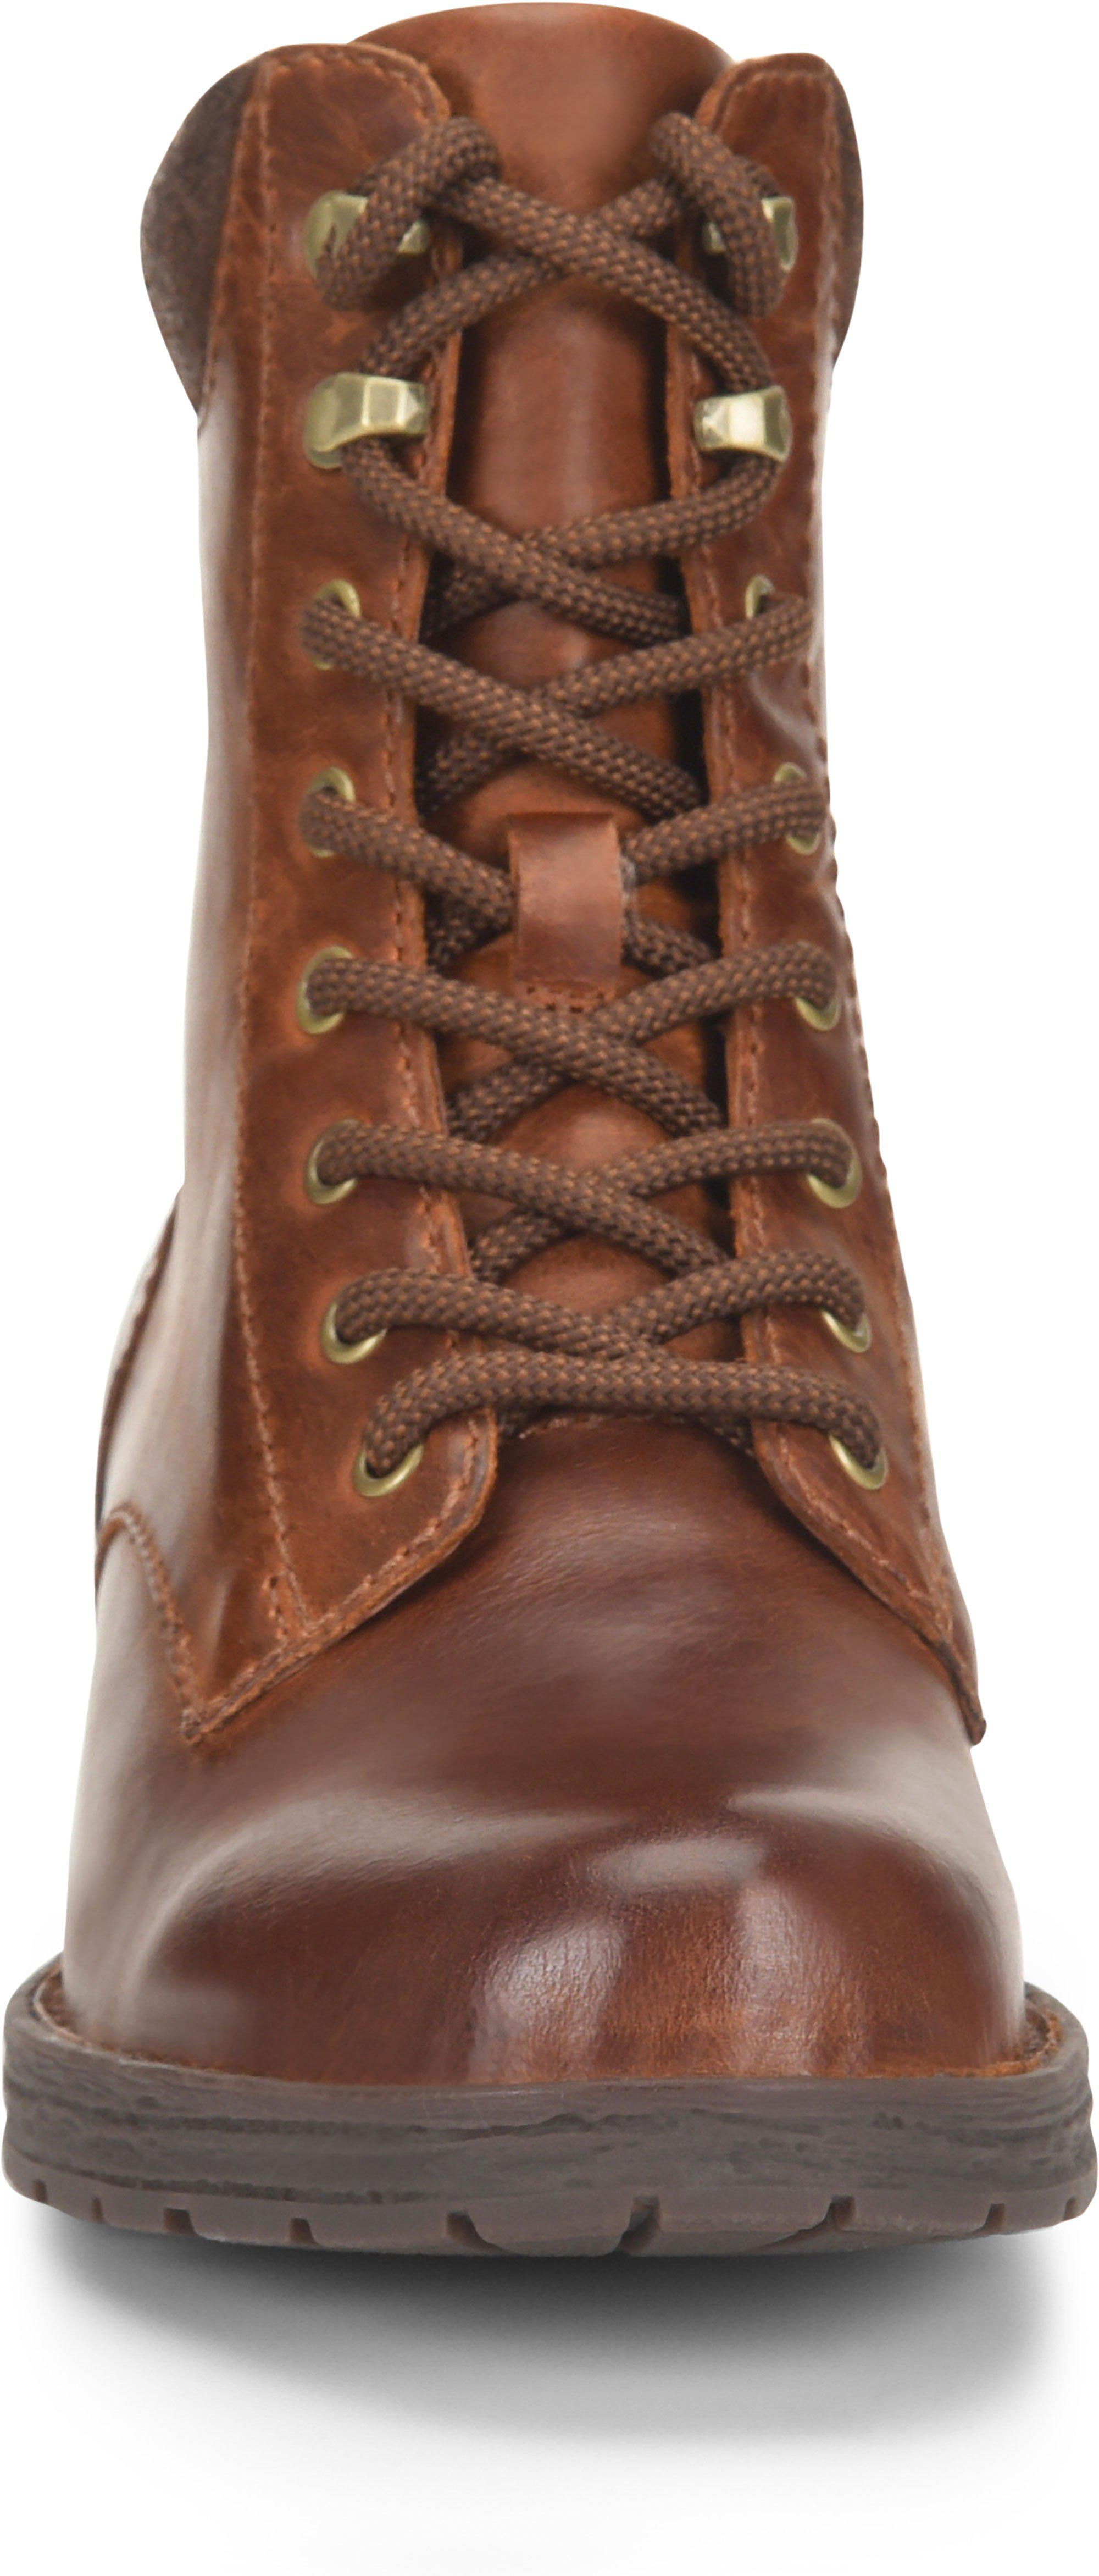 5aaff823c5d Born Shoes Brown Bay Waterproof